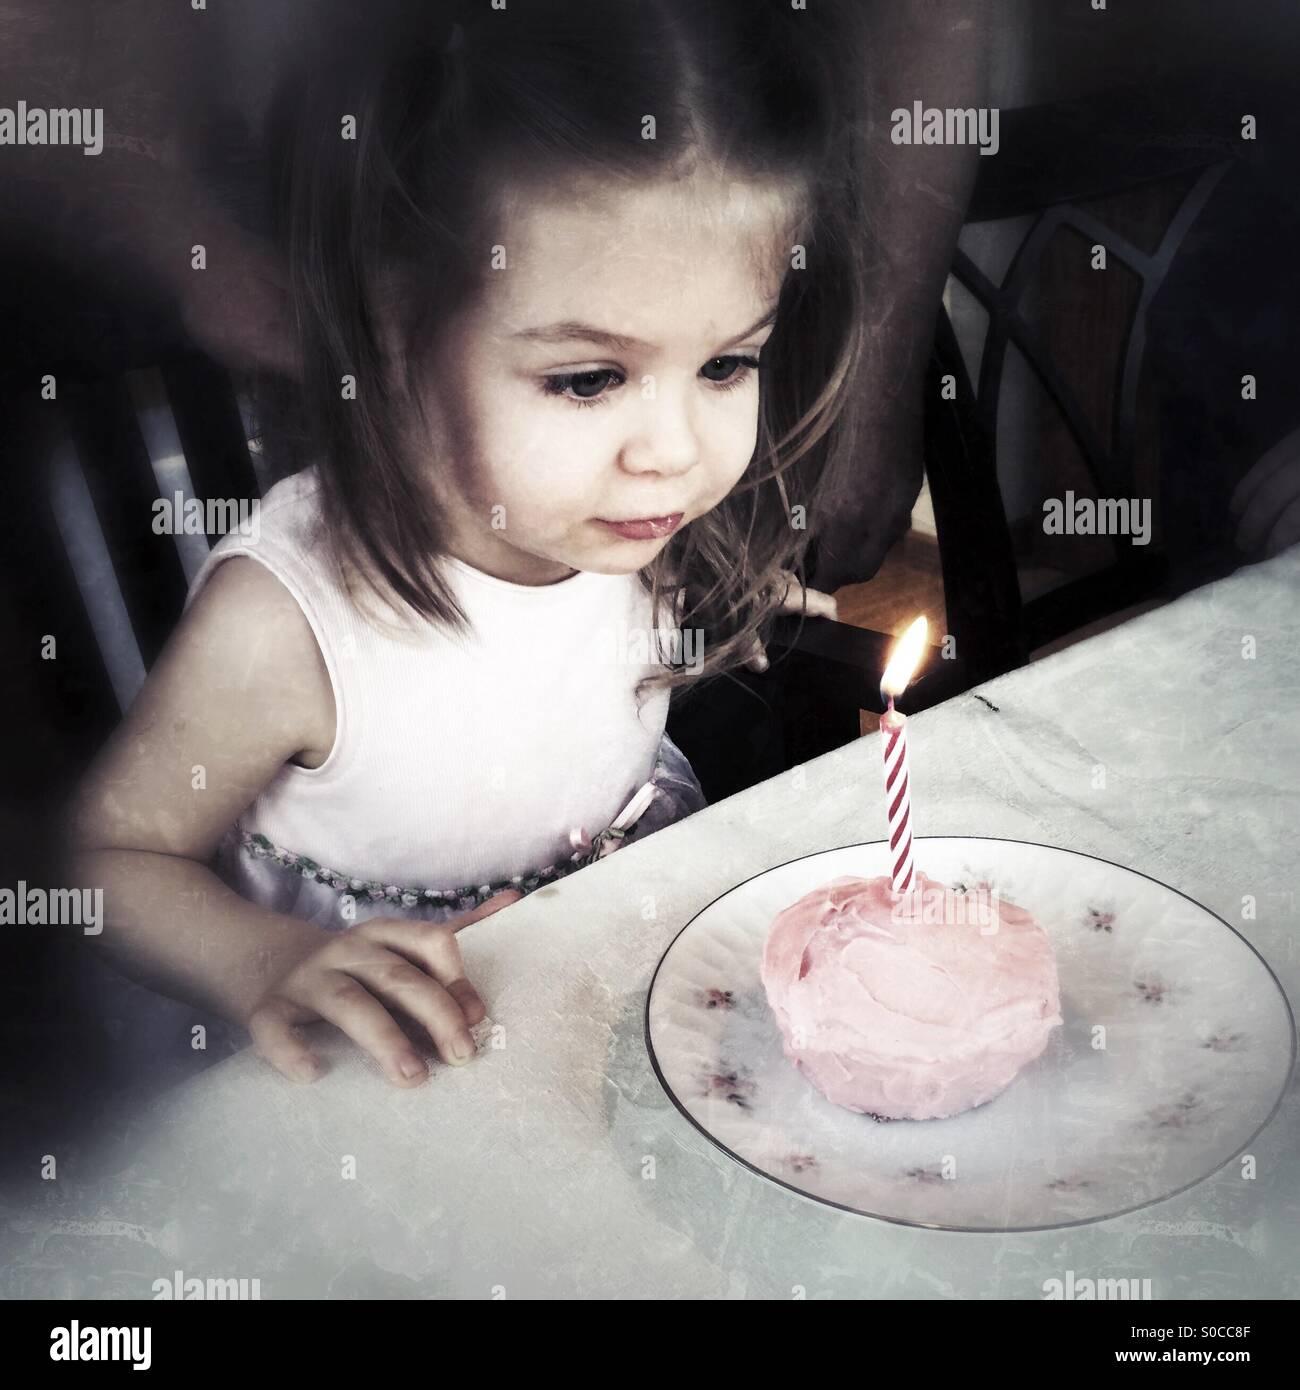 Birthday Candle - Stock Image